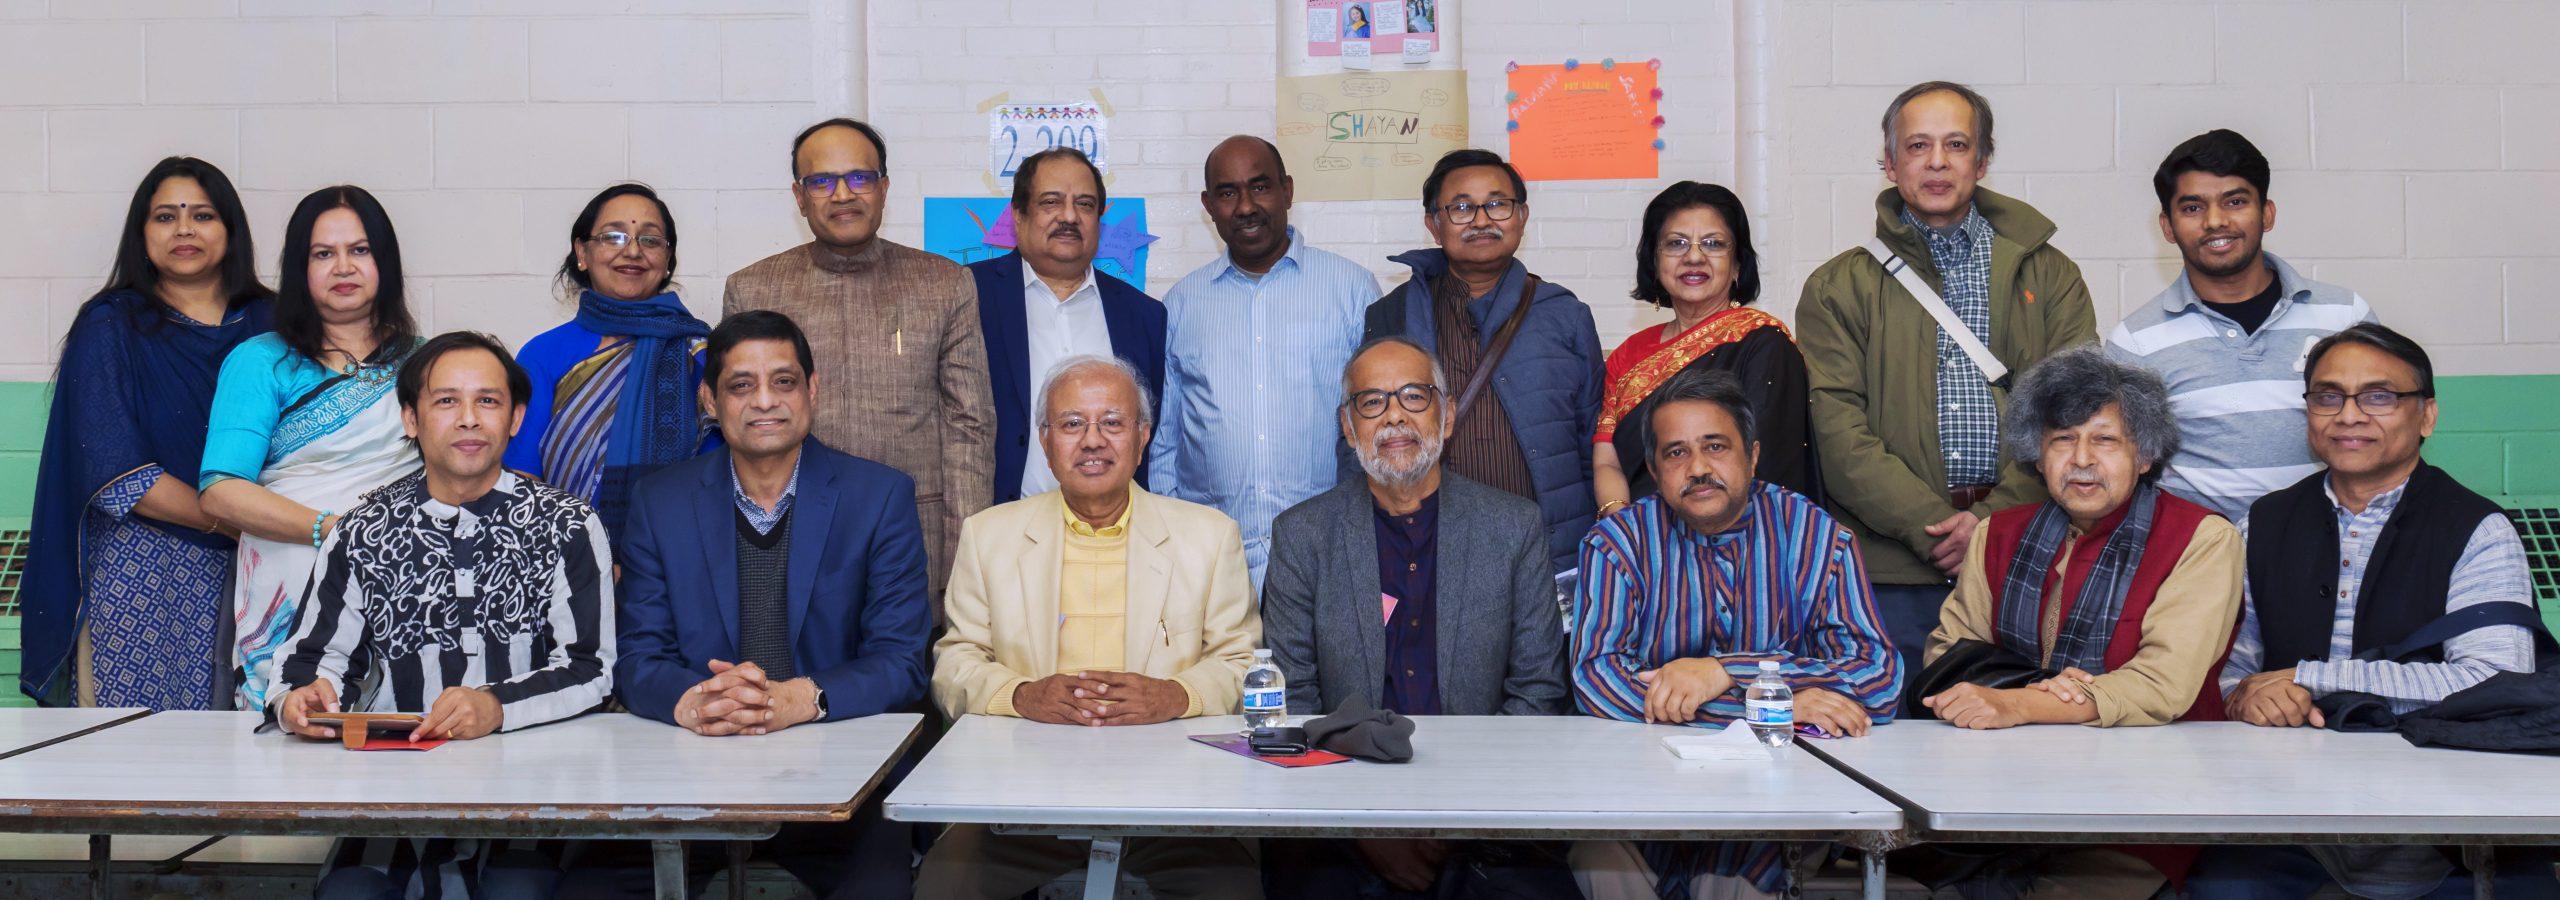 Muktadhara Foundation Executive Committee Members